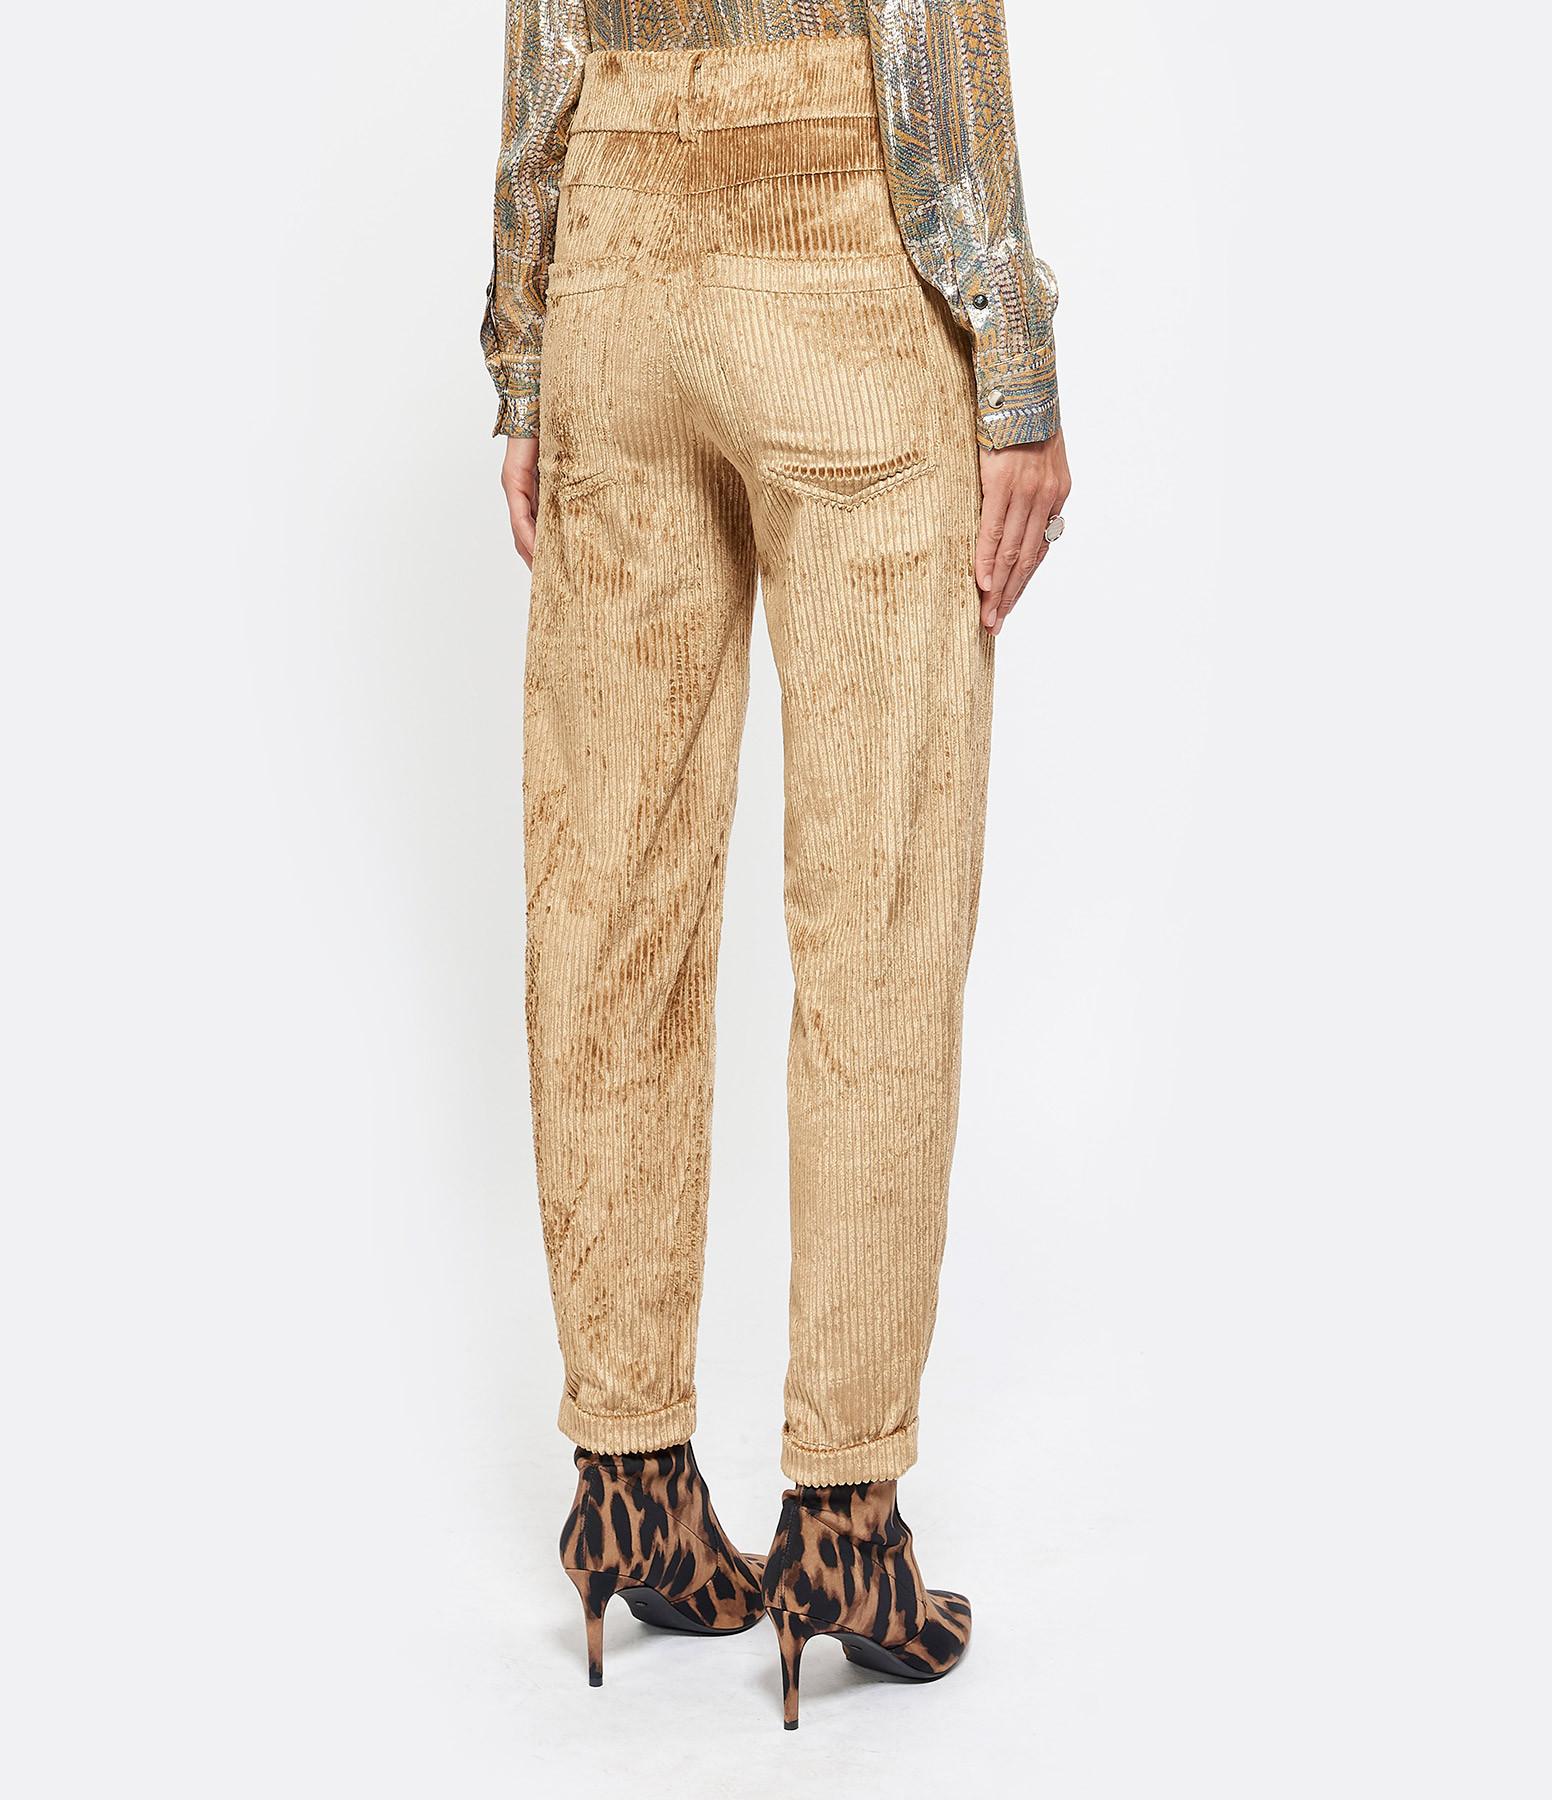 MARGAUX LONNBERG - Pantalon Jarvis Coton Camel